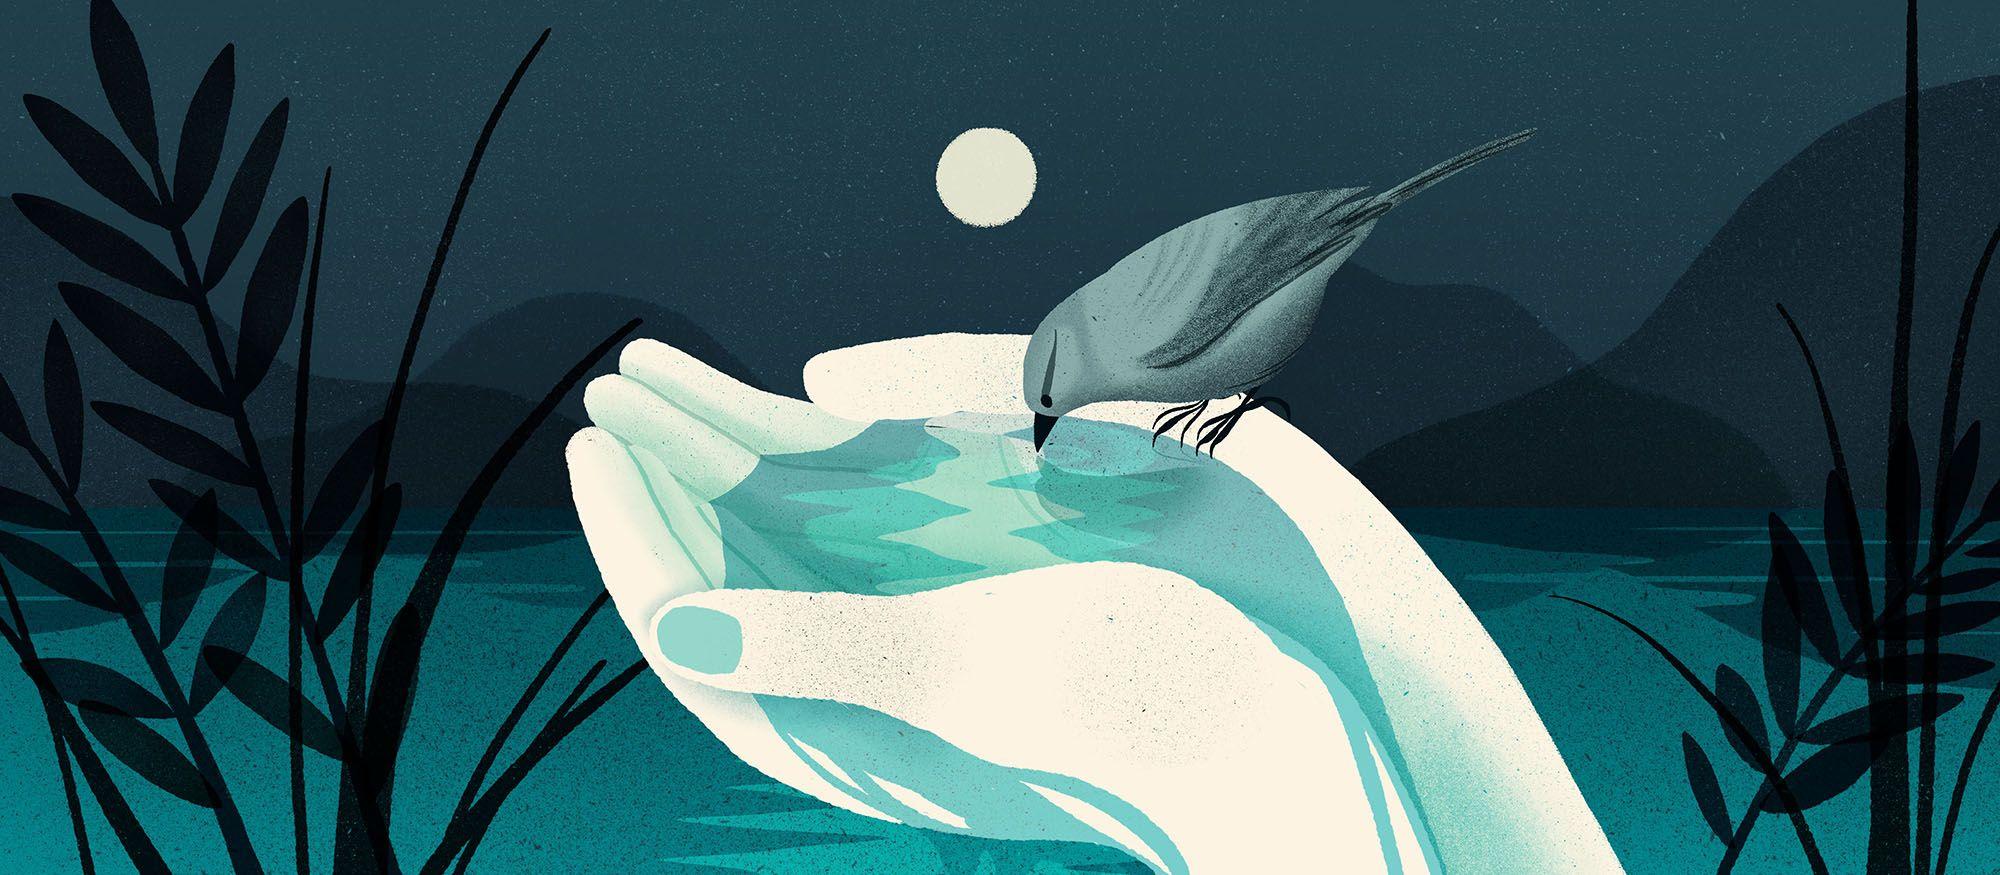 Fountain Geraldine Sy 插画 画